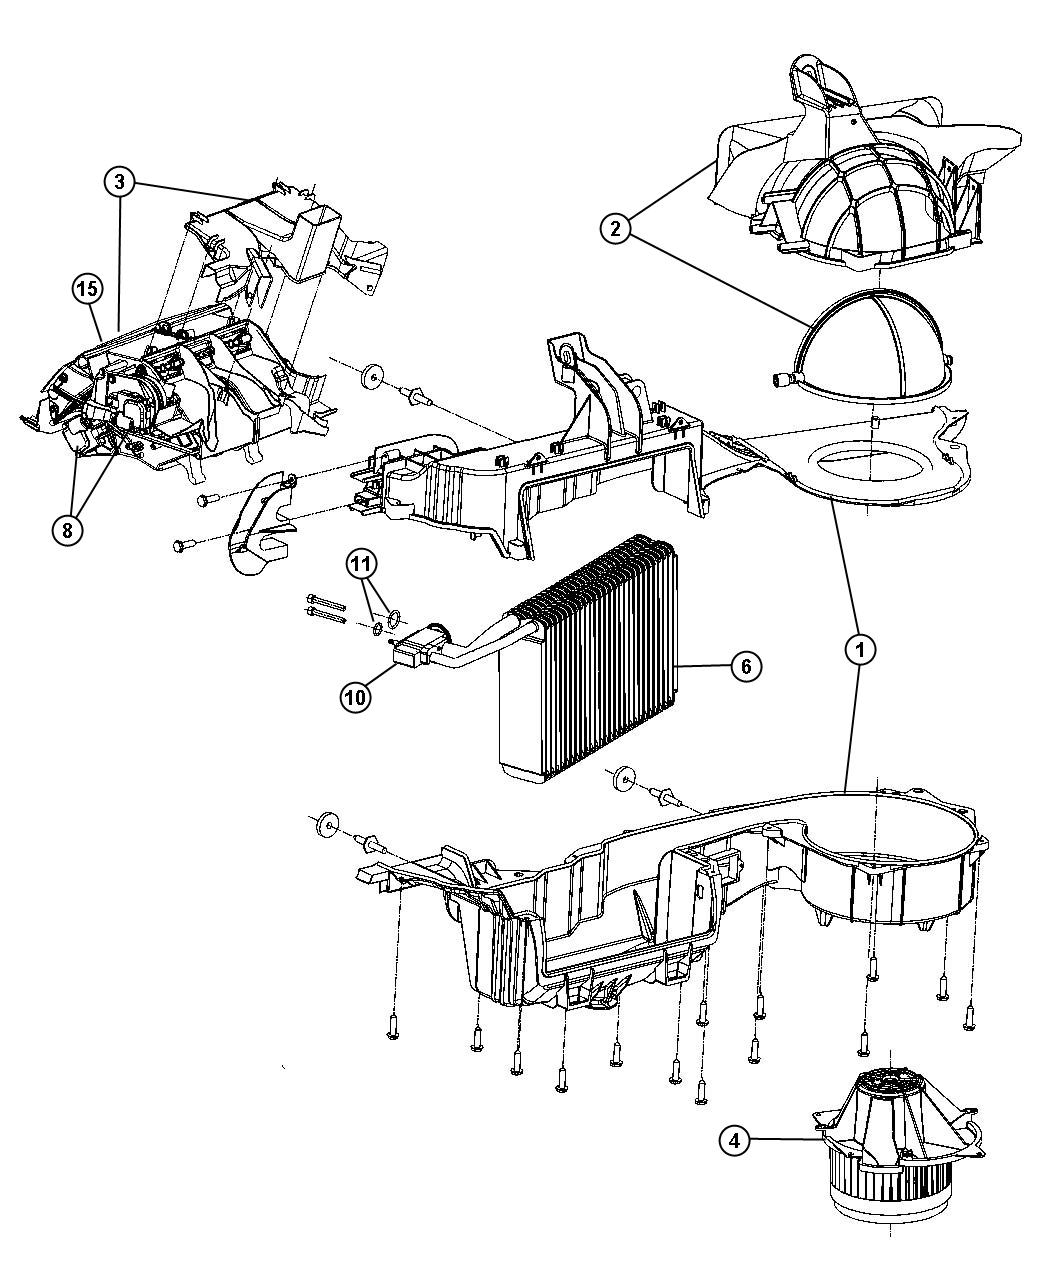 Factorychryslerparts e i2208243